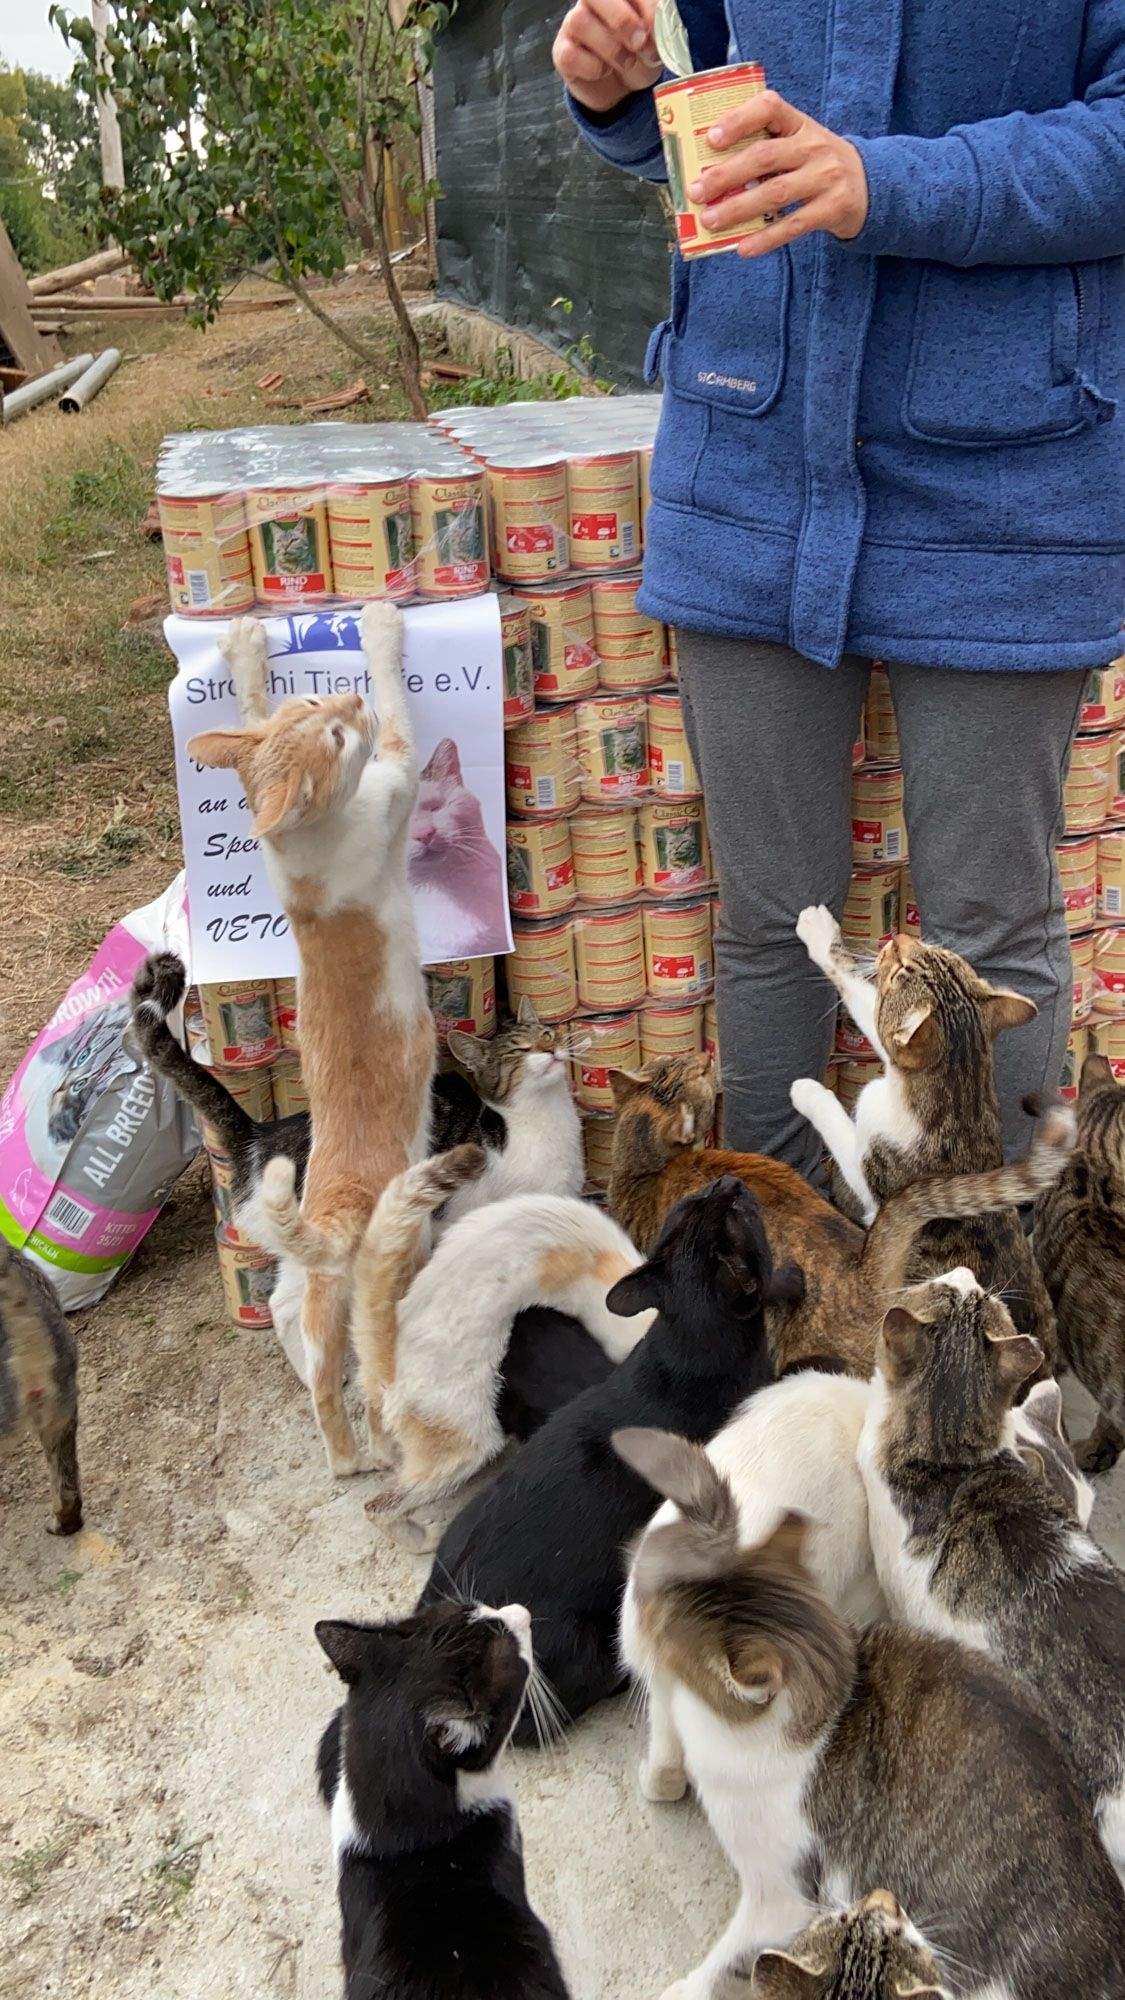 Strolchi Tierhilfe eV_SfS21_Bulgarien15